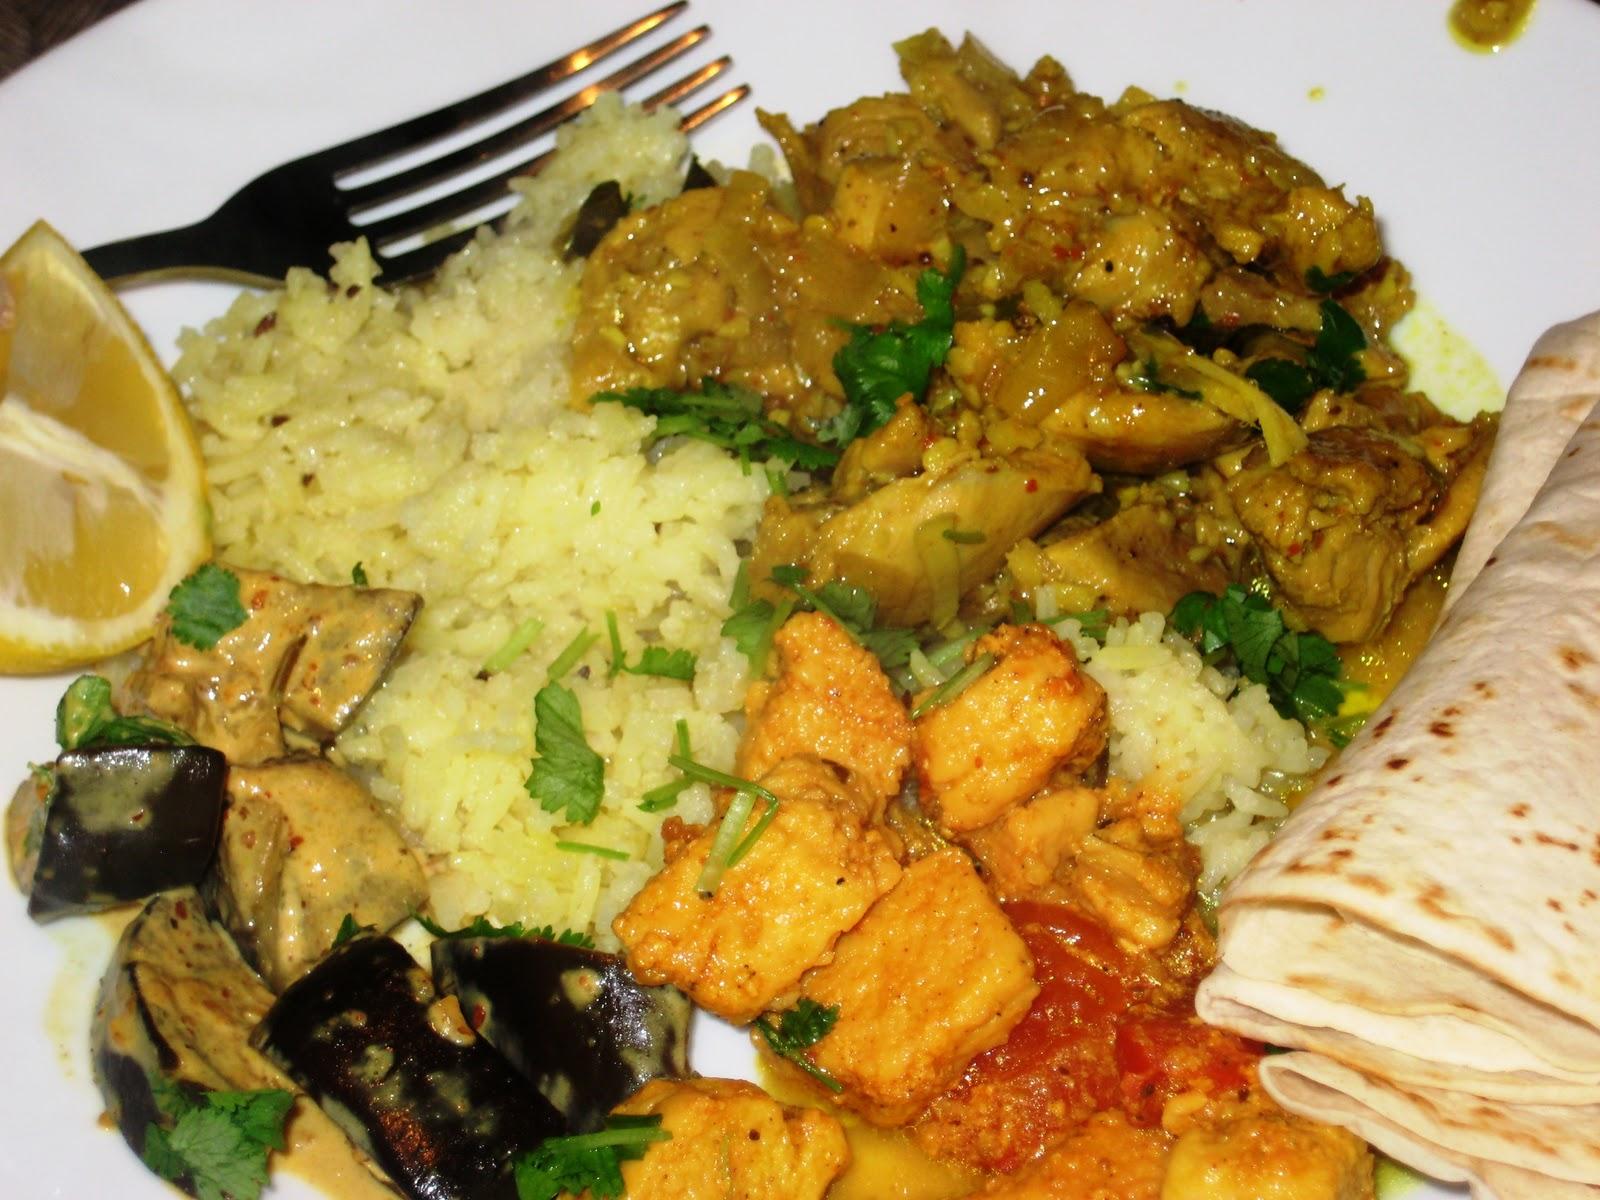 AGA Cooking At JTs Fresh Masala Authentic Indian Cuisine - Cuisine aga